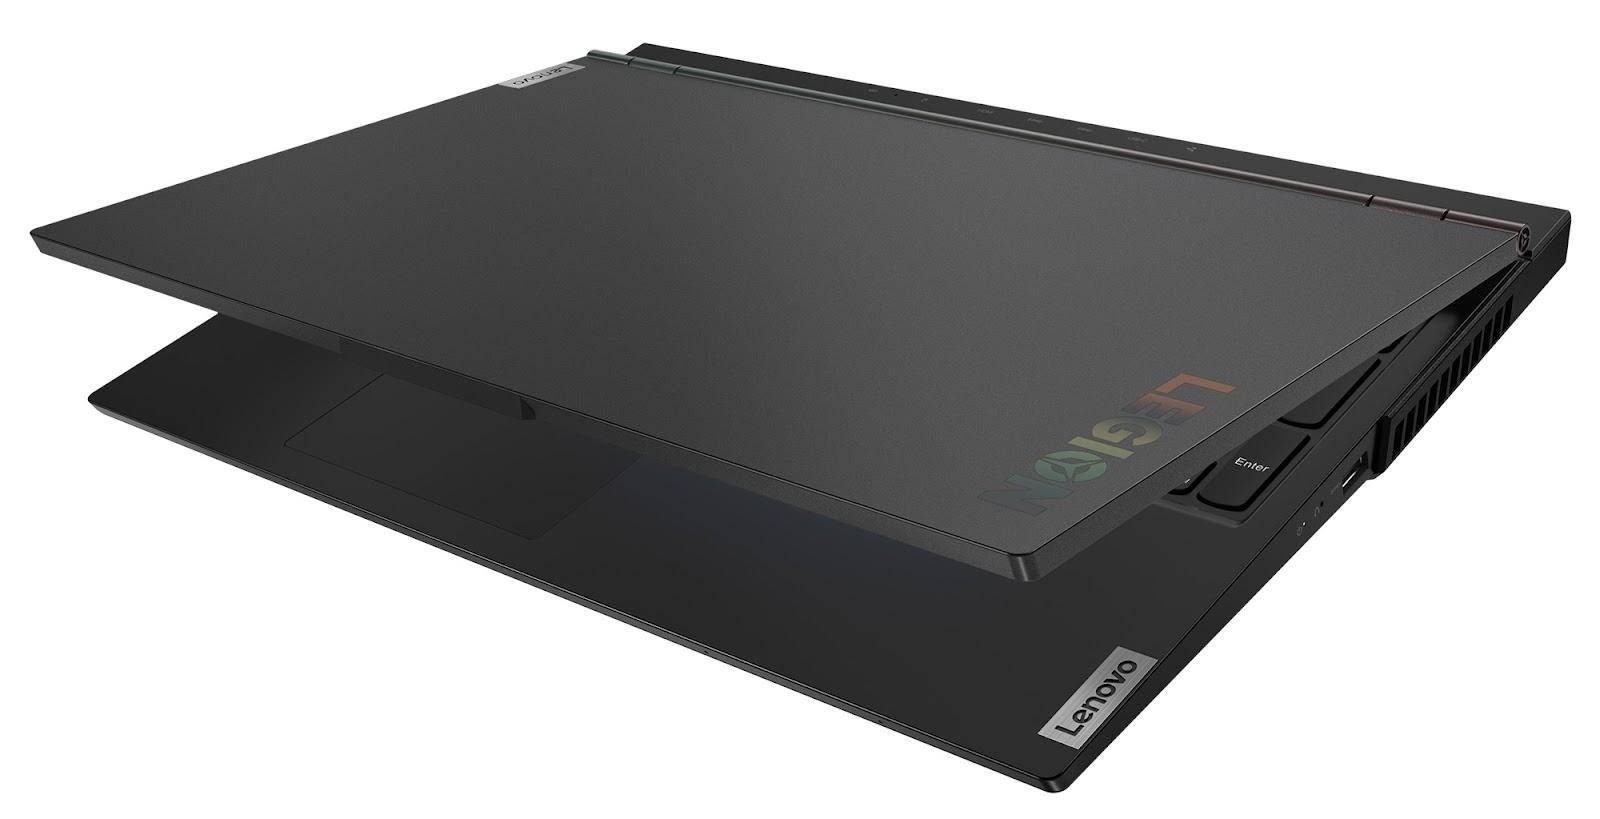 Фото 3. Ноутбук Lenovo Legion 5 15IMH05H Phantom Black (81Y600CYRE)